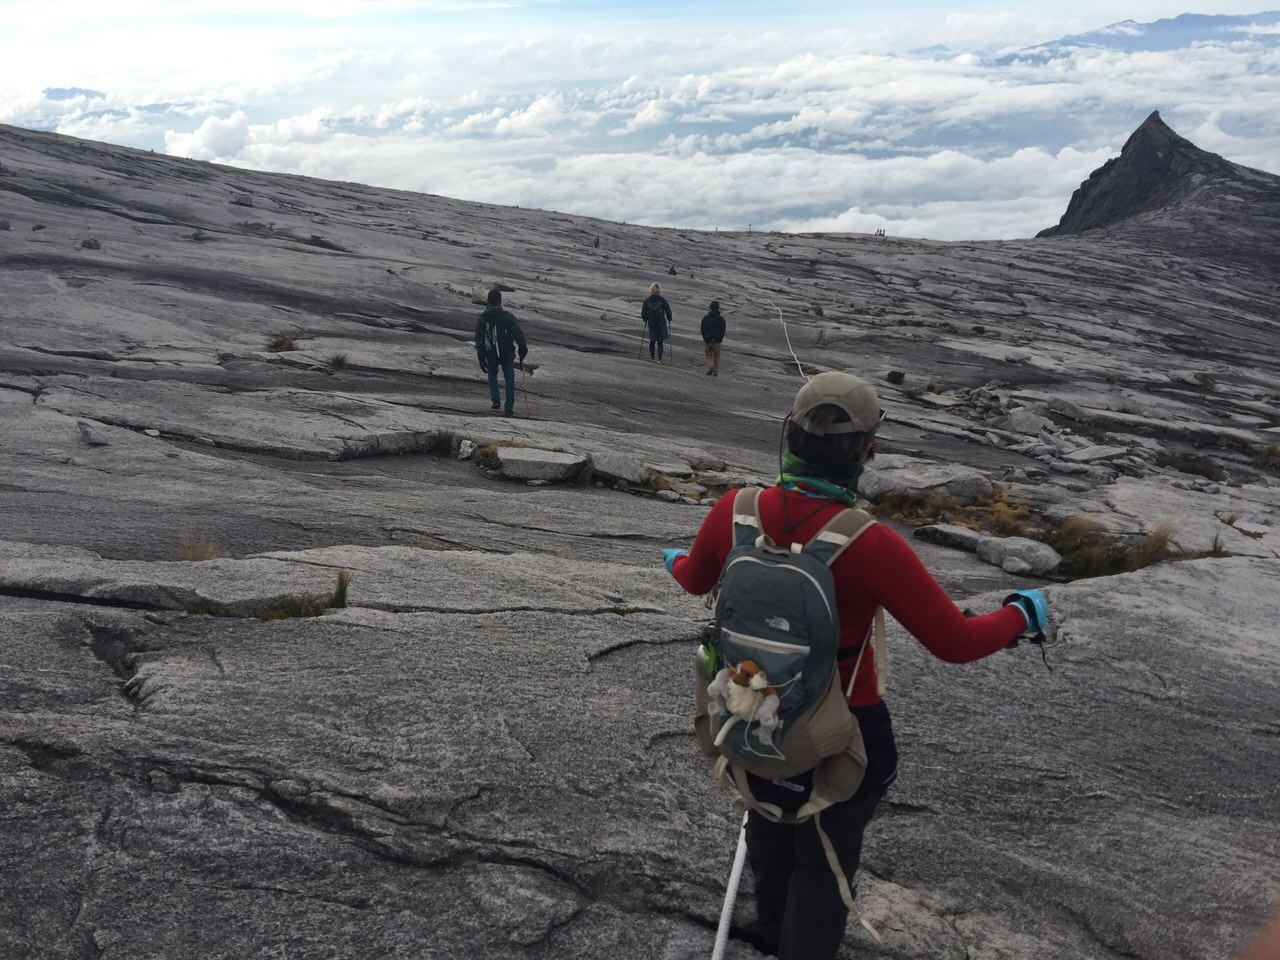 Kota Kinabalu climbing 4173